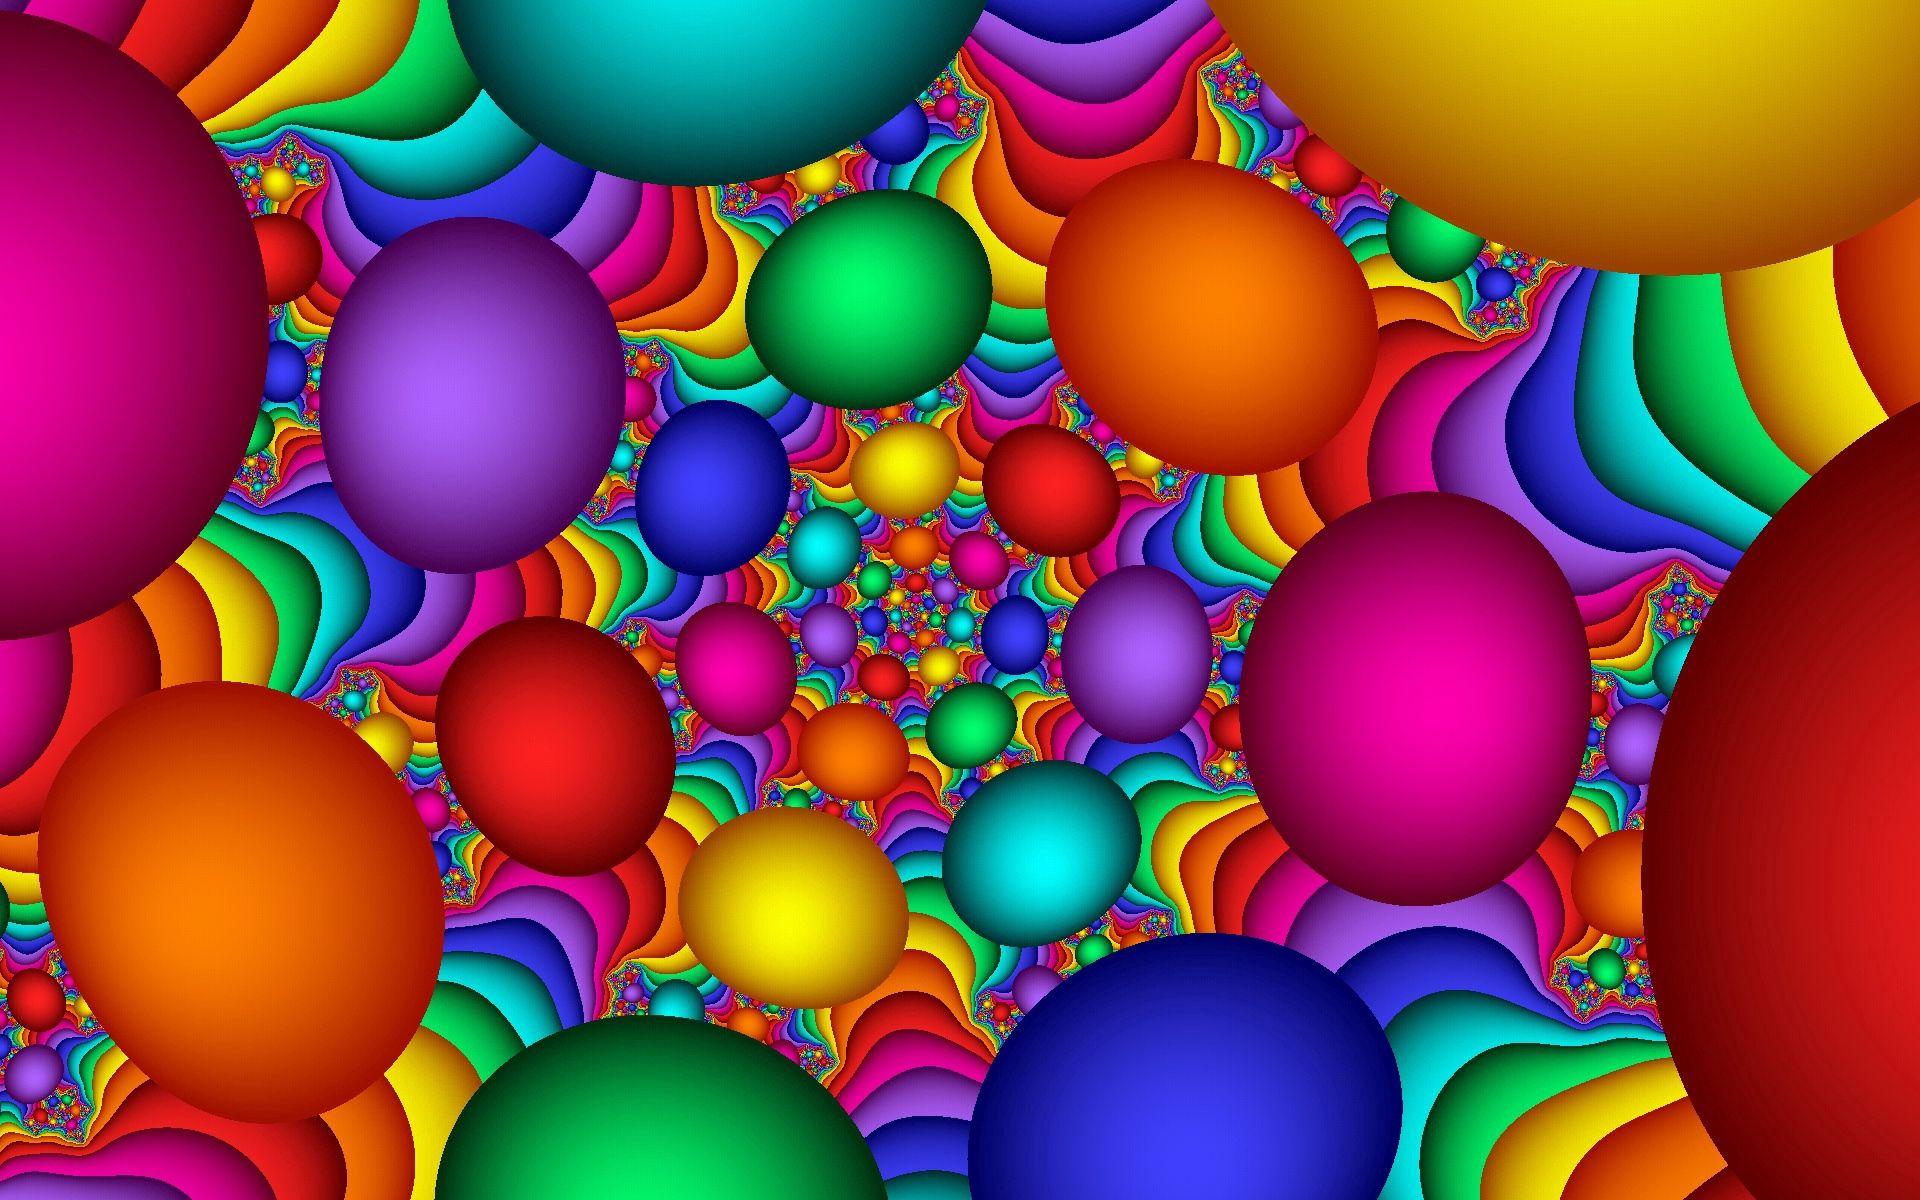 72167 descargar fondo de pantalla Abstracción, Pelotas, Bolas, Multicolor, Abigarrado, Fondo, Brillante: protectores de pantalla e imágenes gratis